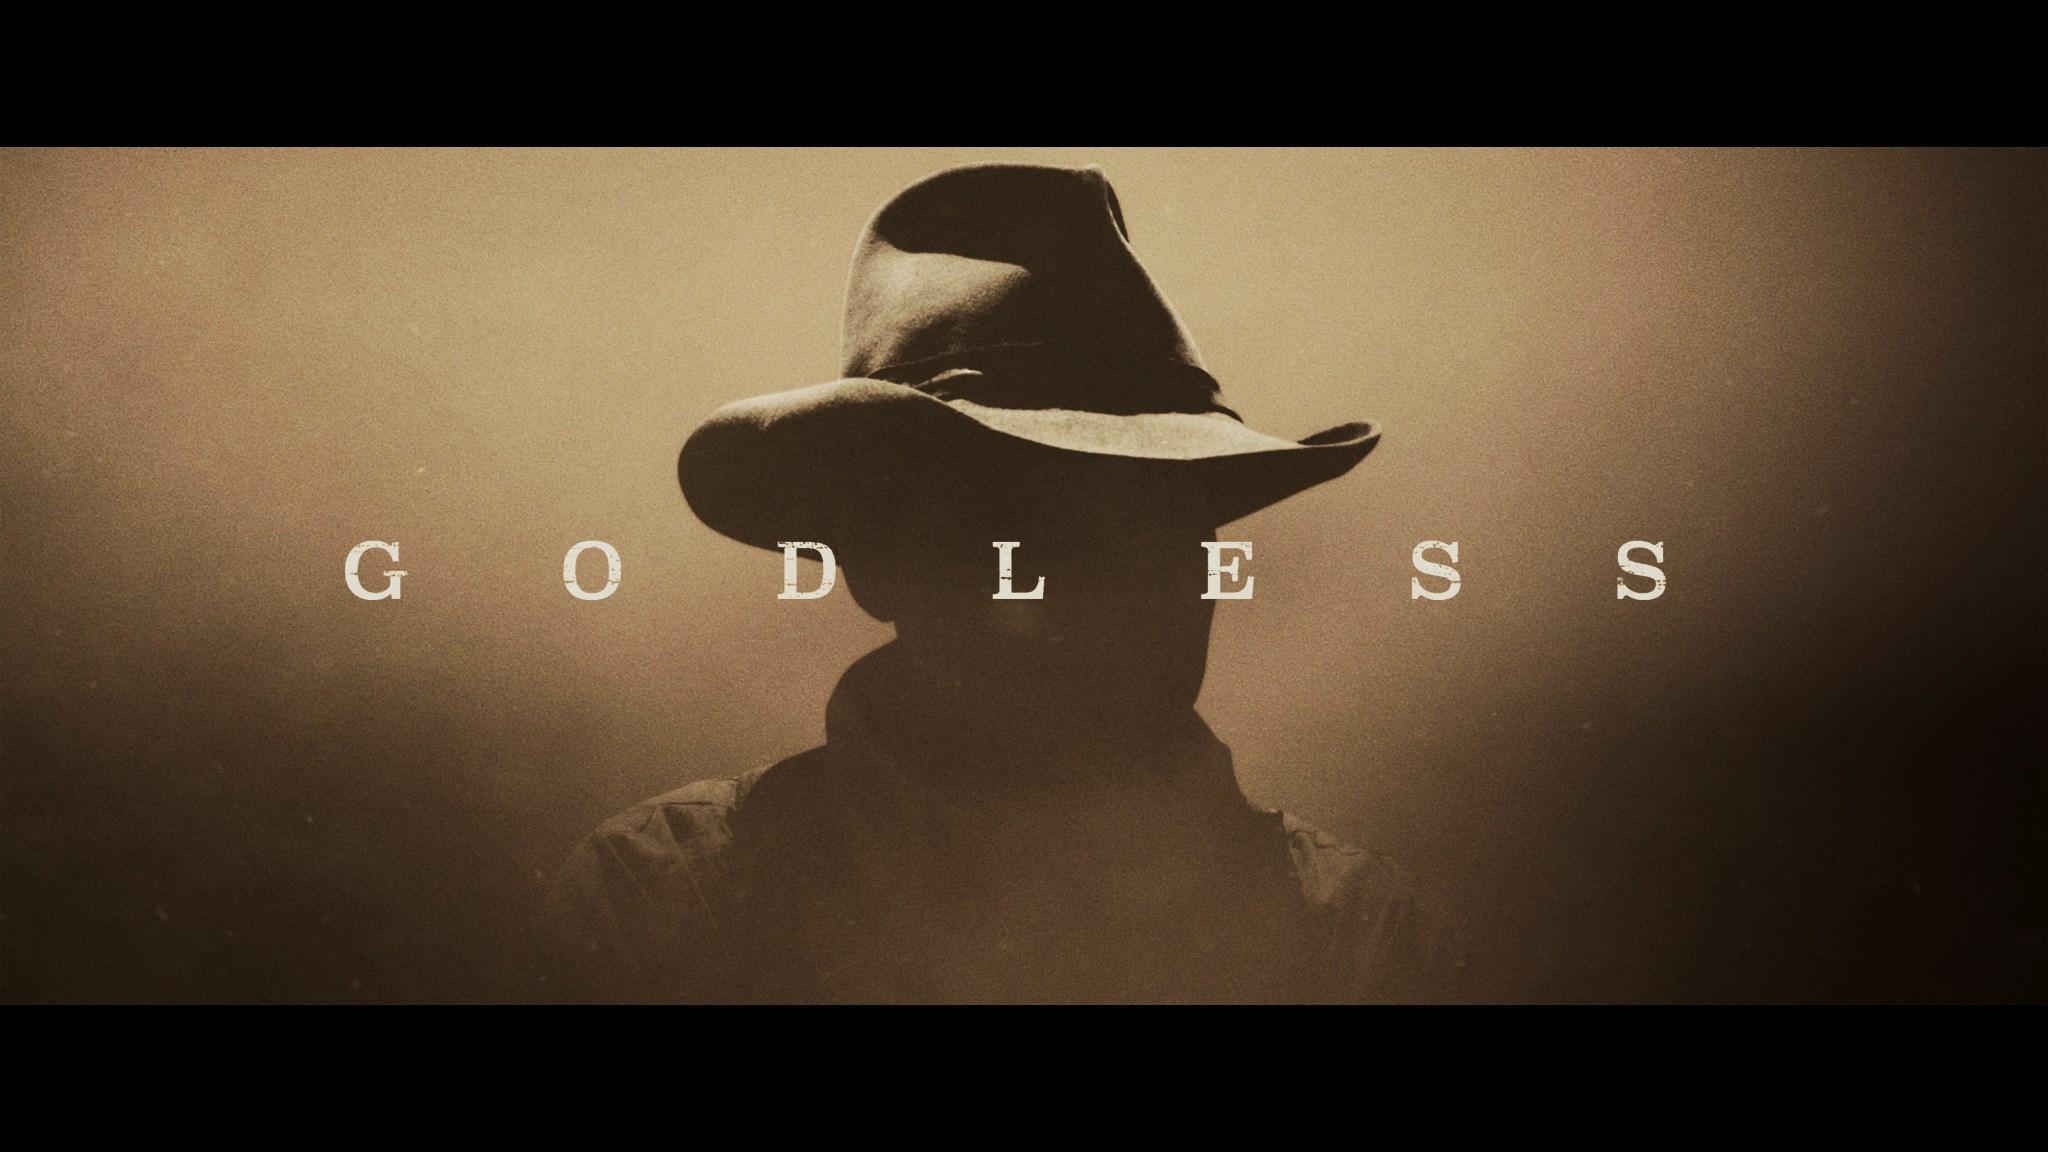 Netflix Godless | STASH MAGAZINE